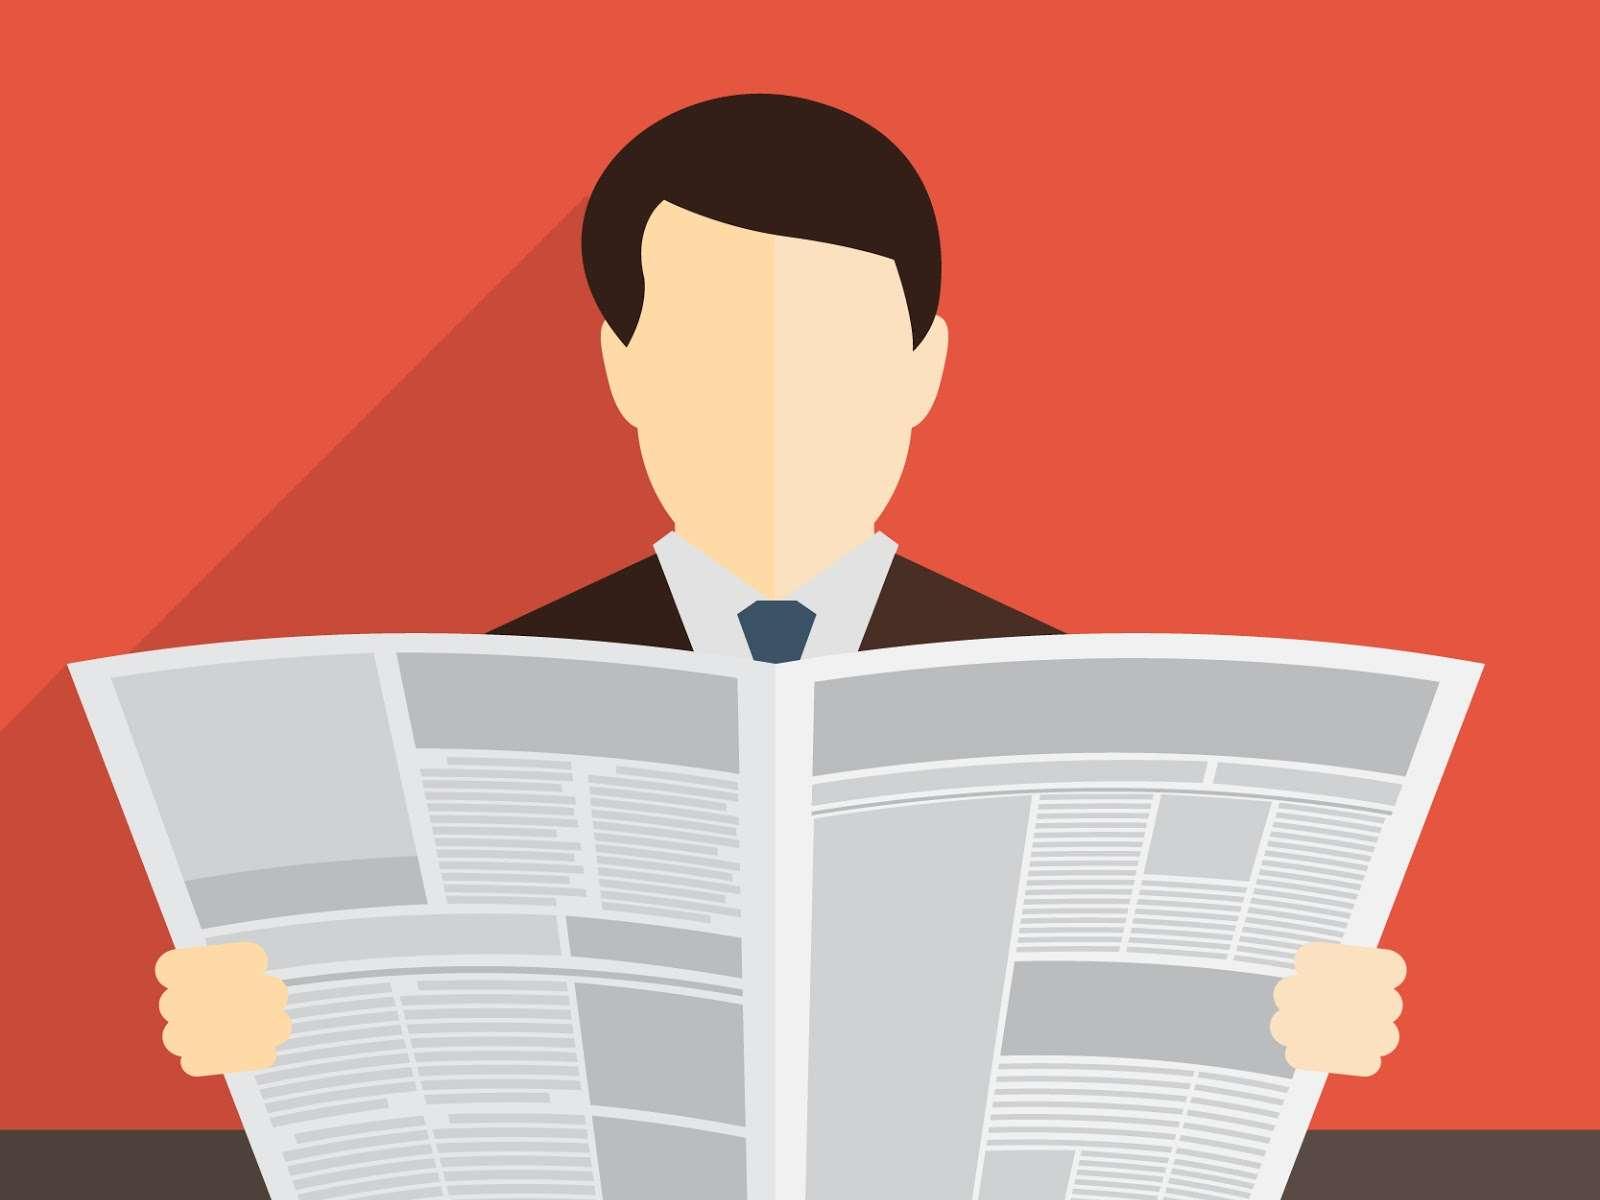 Journalist clipart attention please #6